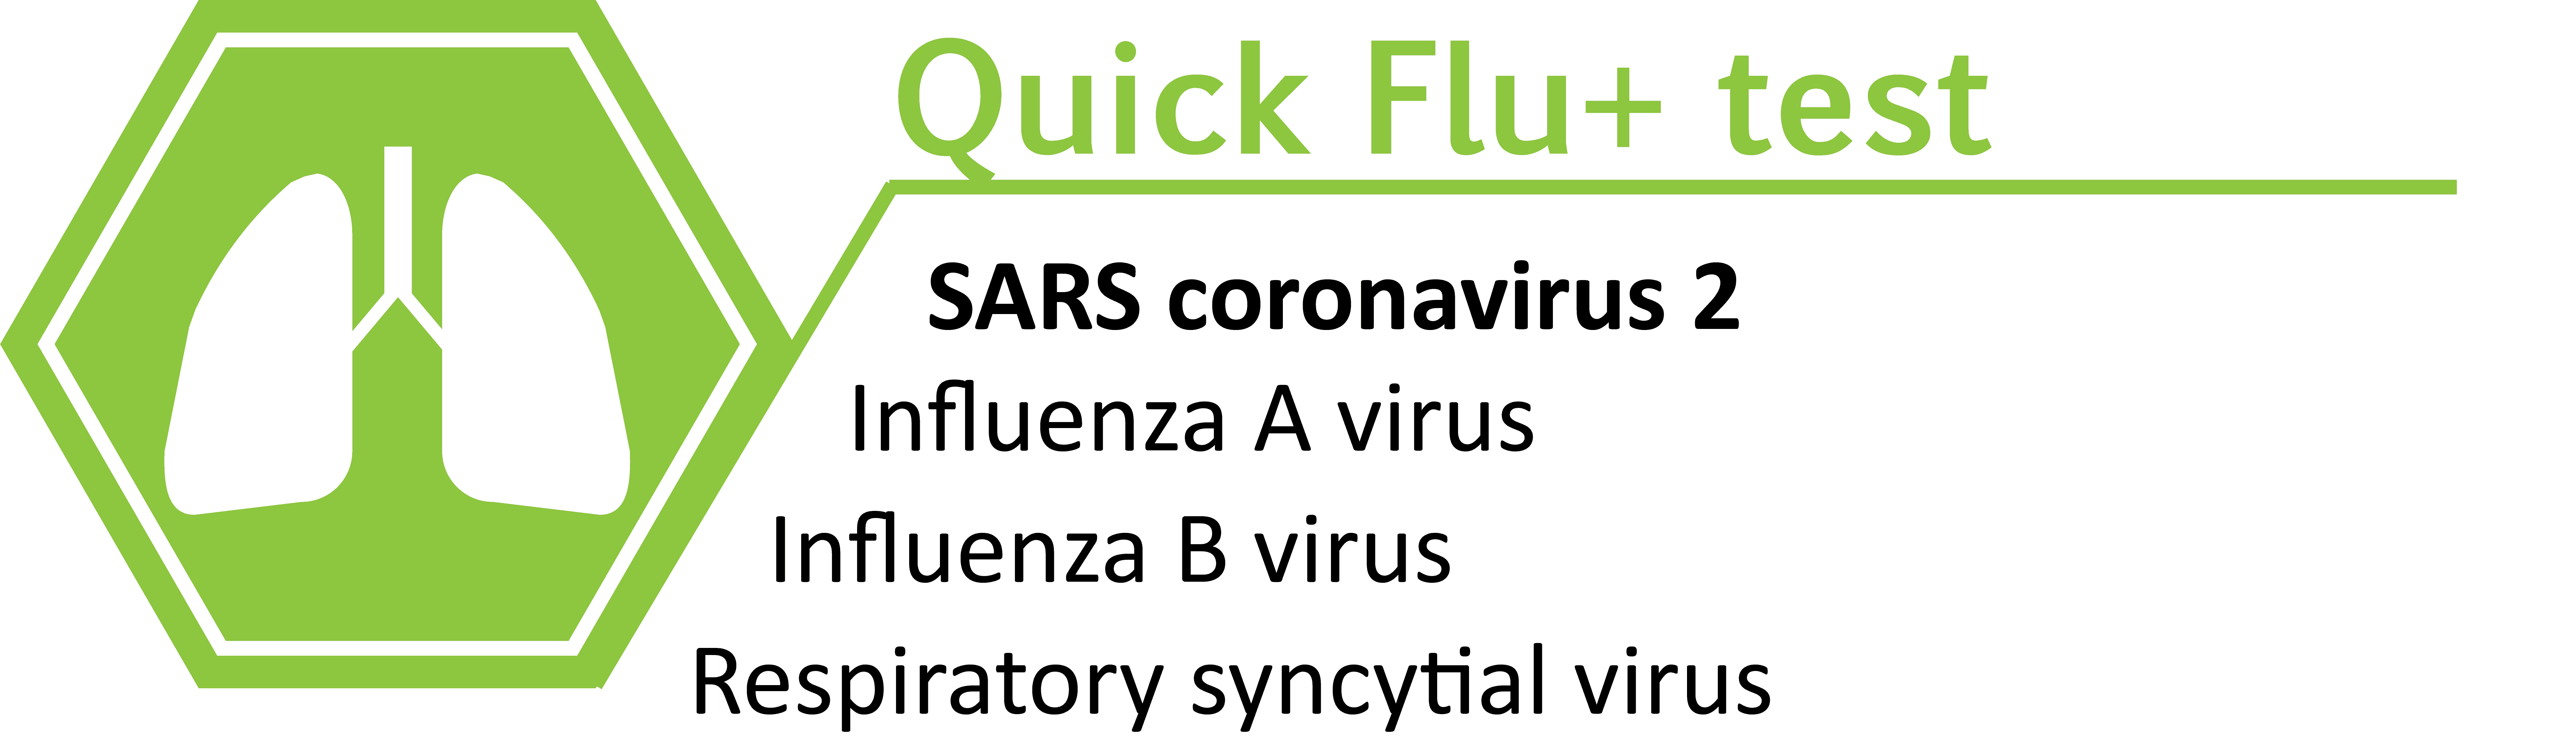 mariPOC Quick FLu+ test panel